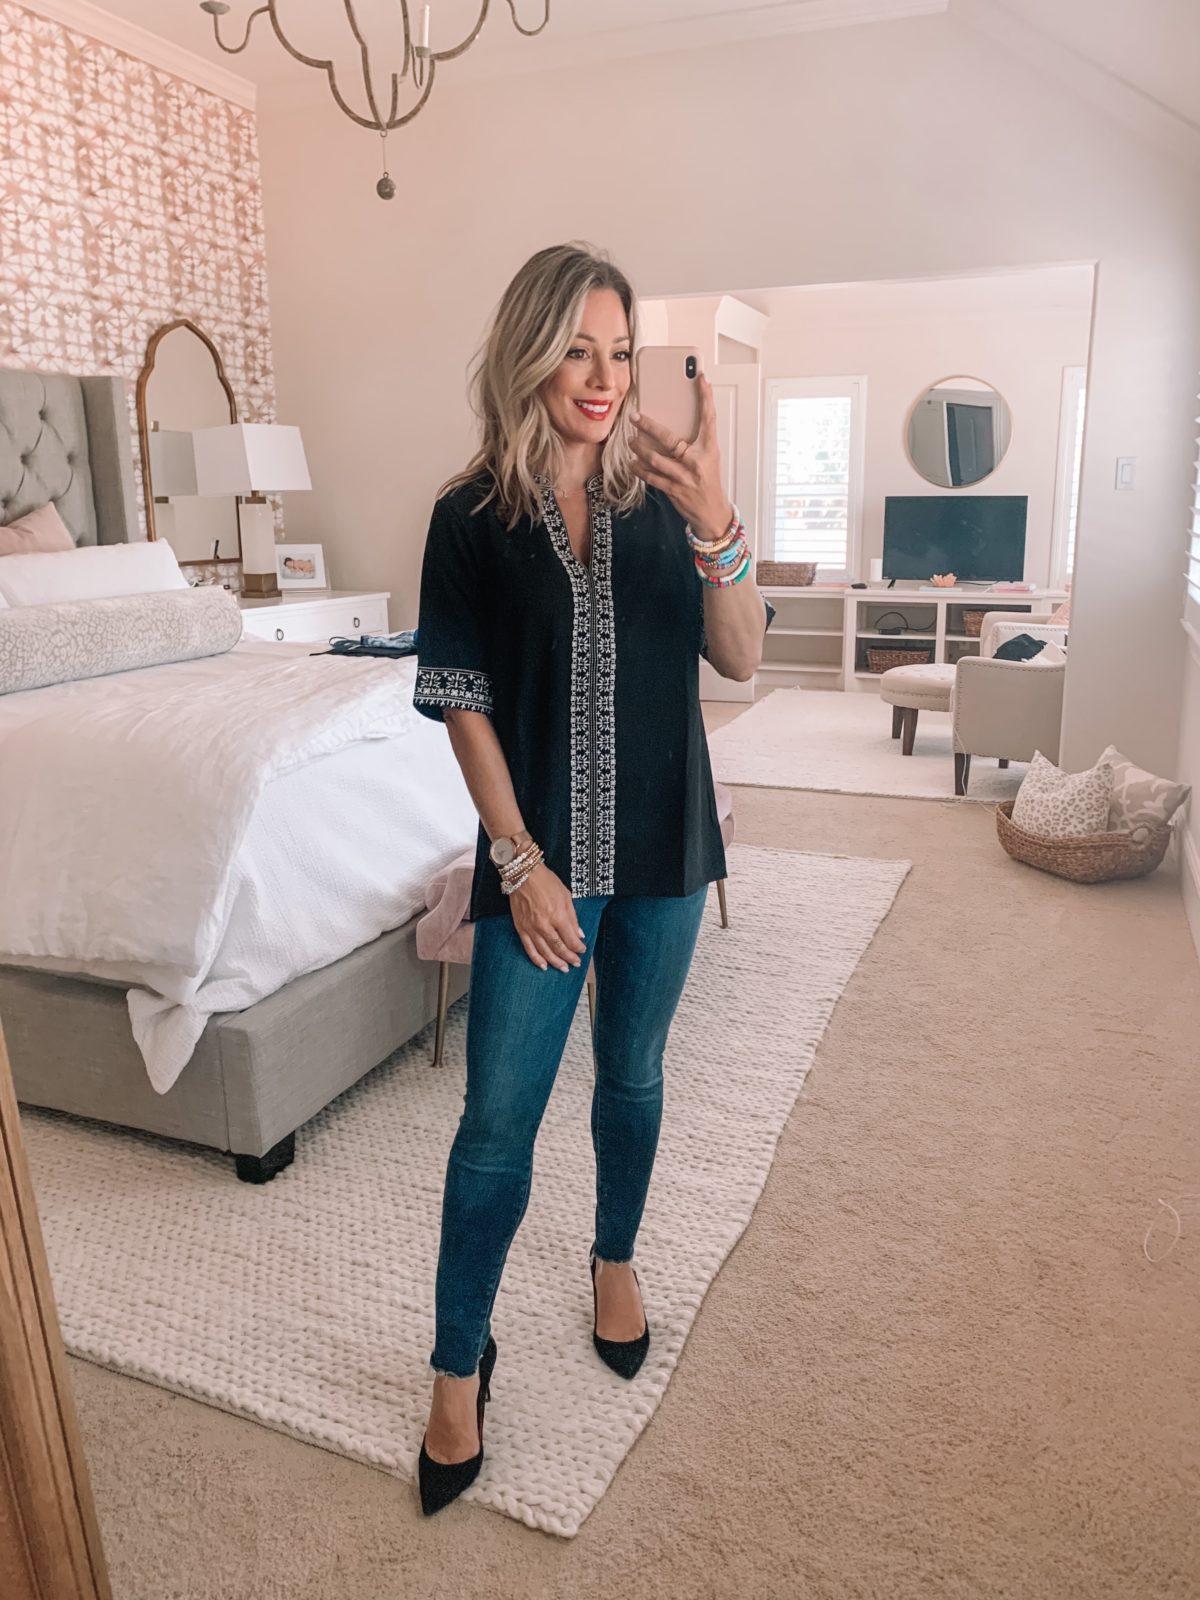 Amazon Fashion Finds, Boho Top, Skinny Jeans, Heels